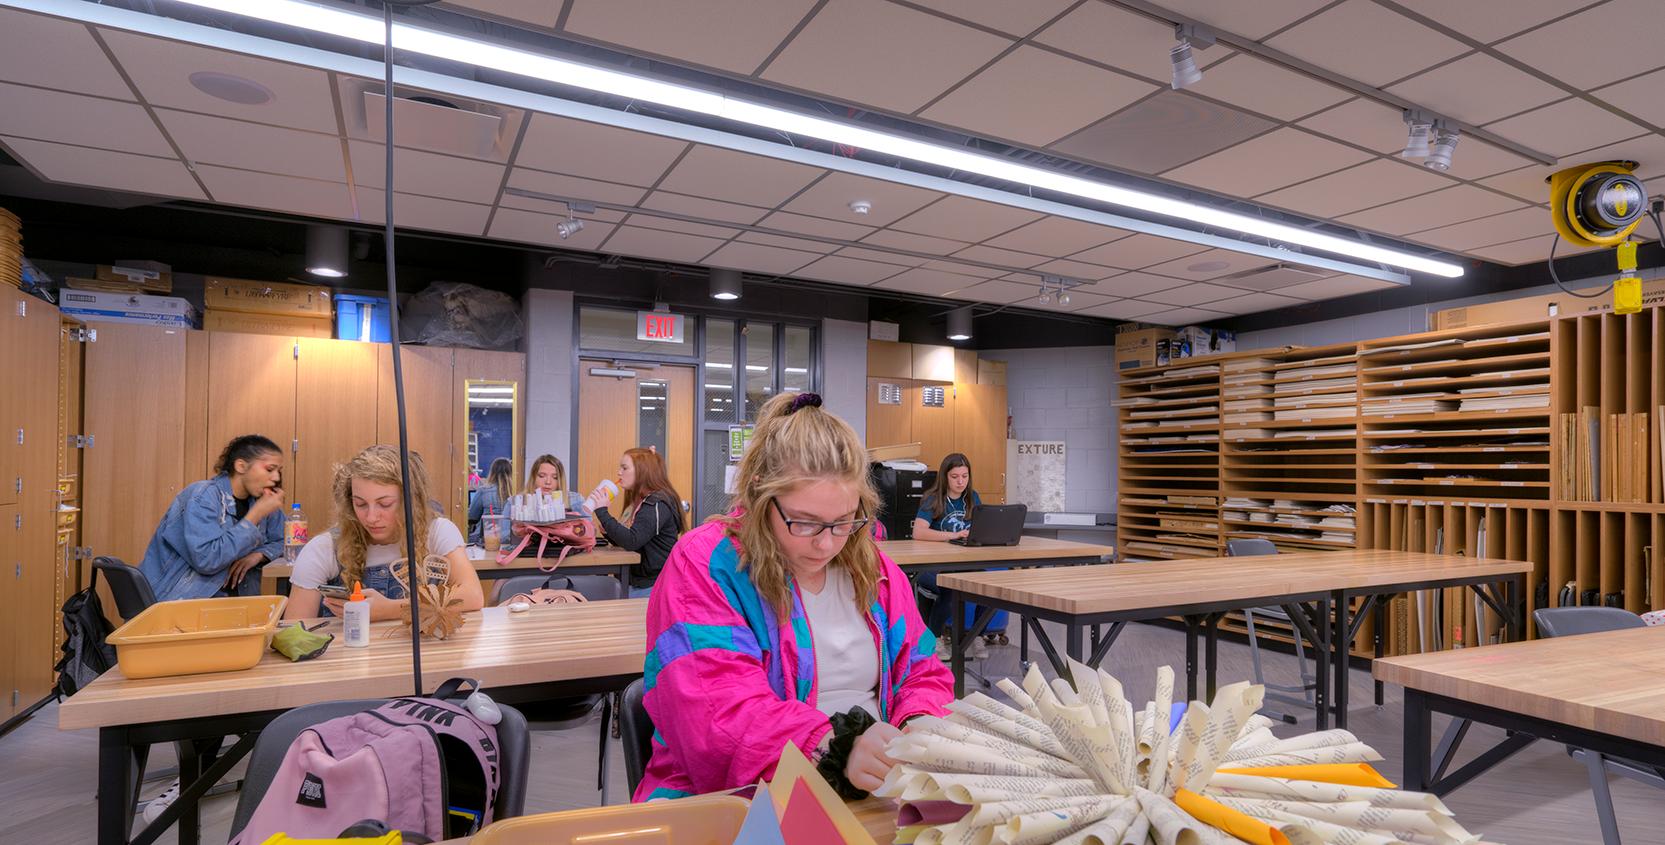 Port-Huron-Northern-High-School-Renovation-Classroom-1665x845